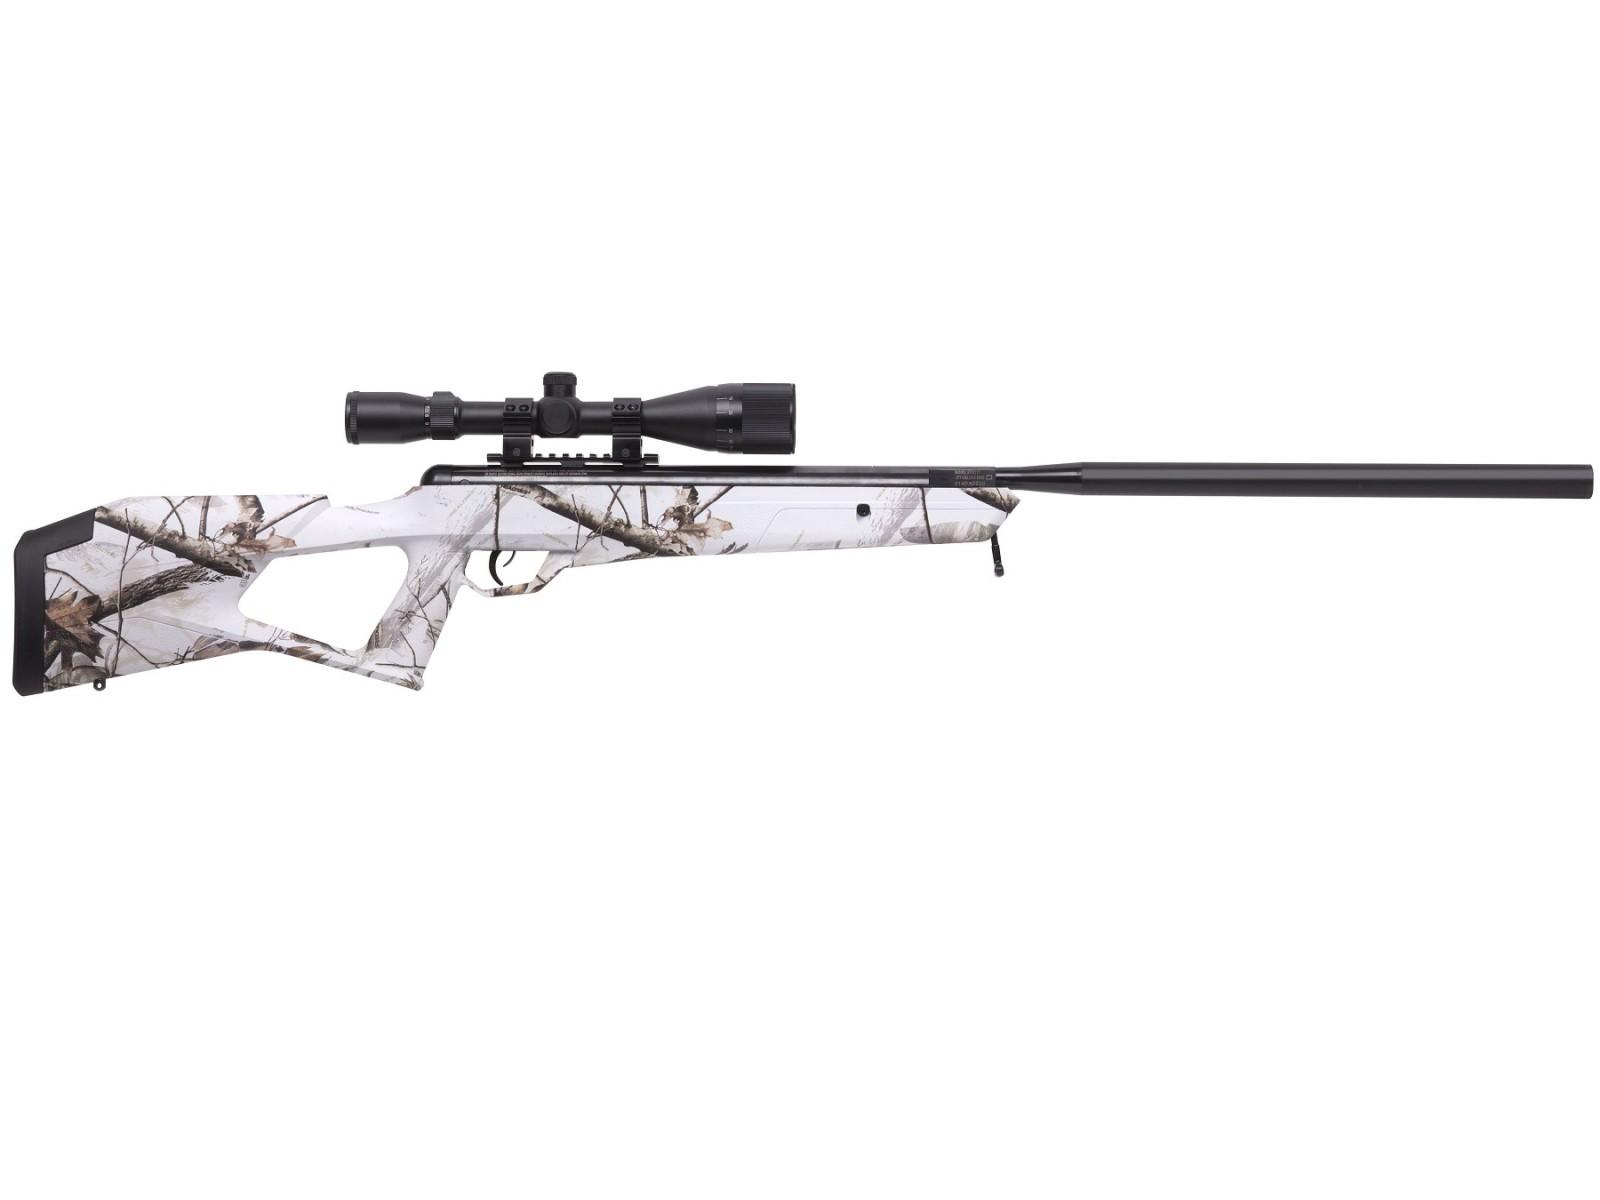 Benjamin Trail NP2 Rifle, Snow Camo, Combo. Air rifles